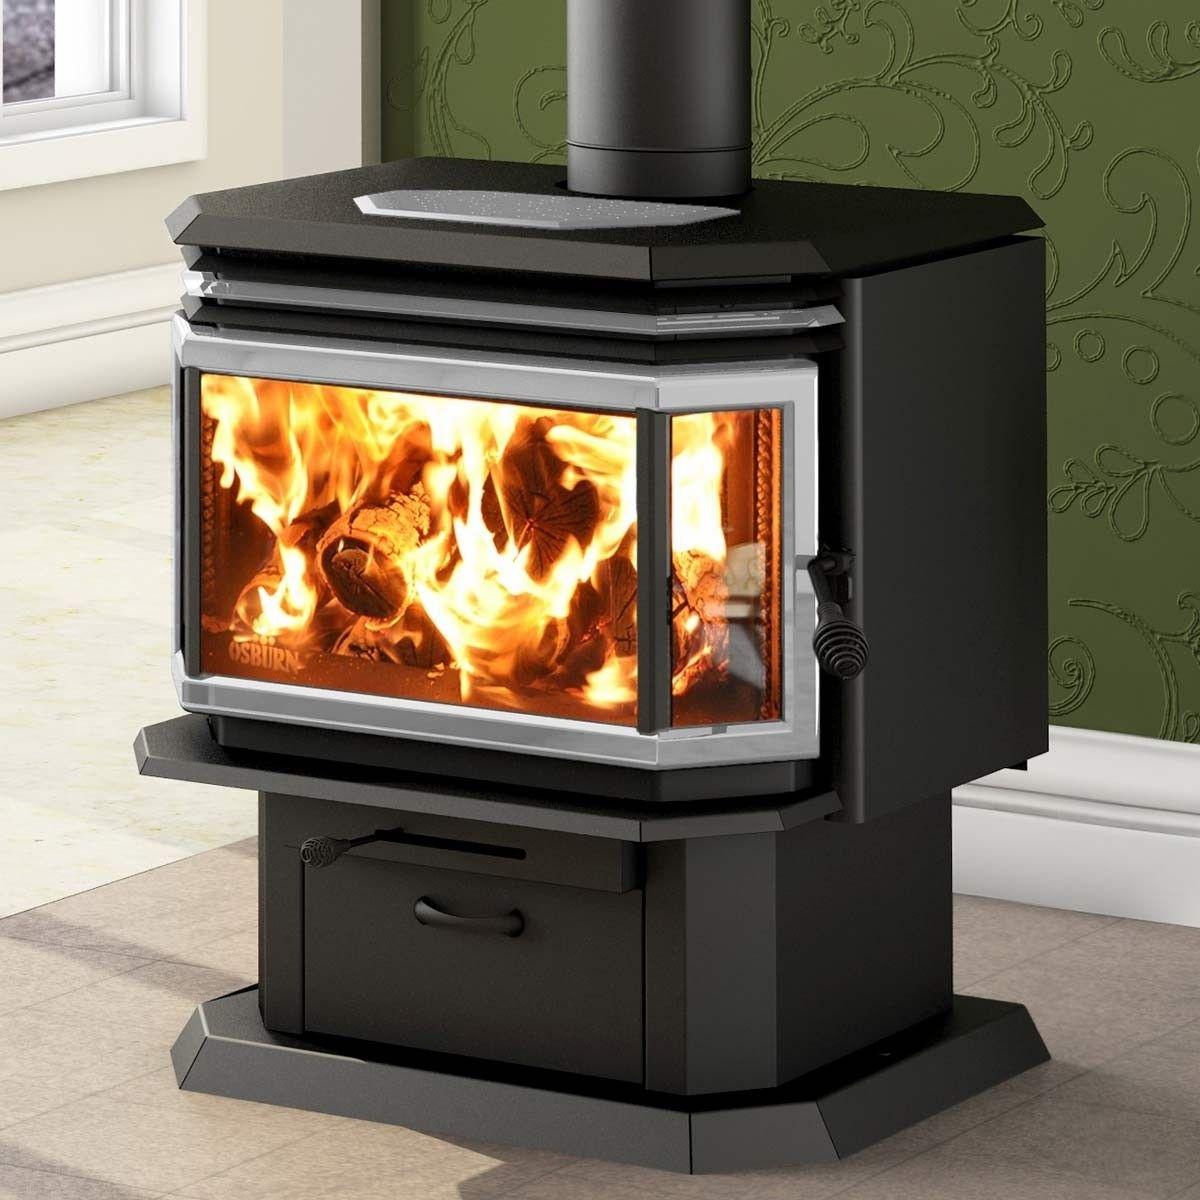 Woodstoves and Fireplaces New Osburn 2200 Metallic Black Epa Wood Stove Ob In 2019